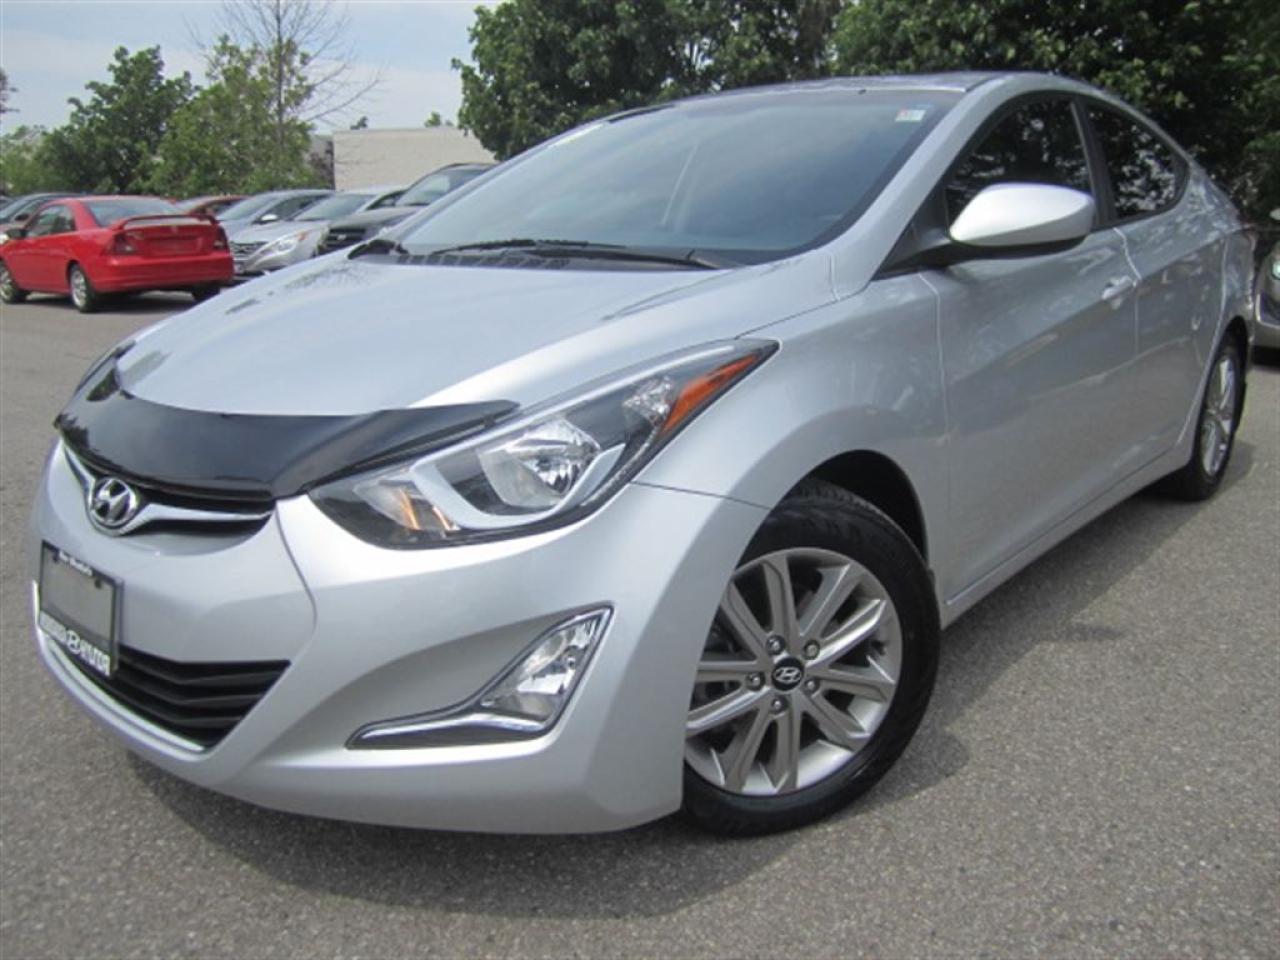 Photo of Silver 2014 Hyundai Elantra